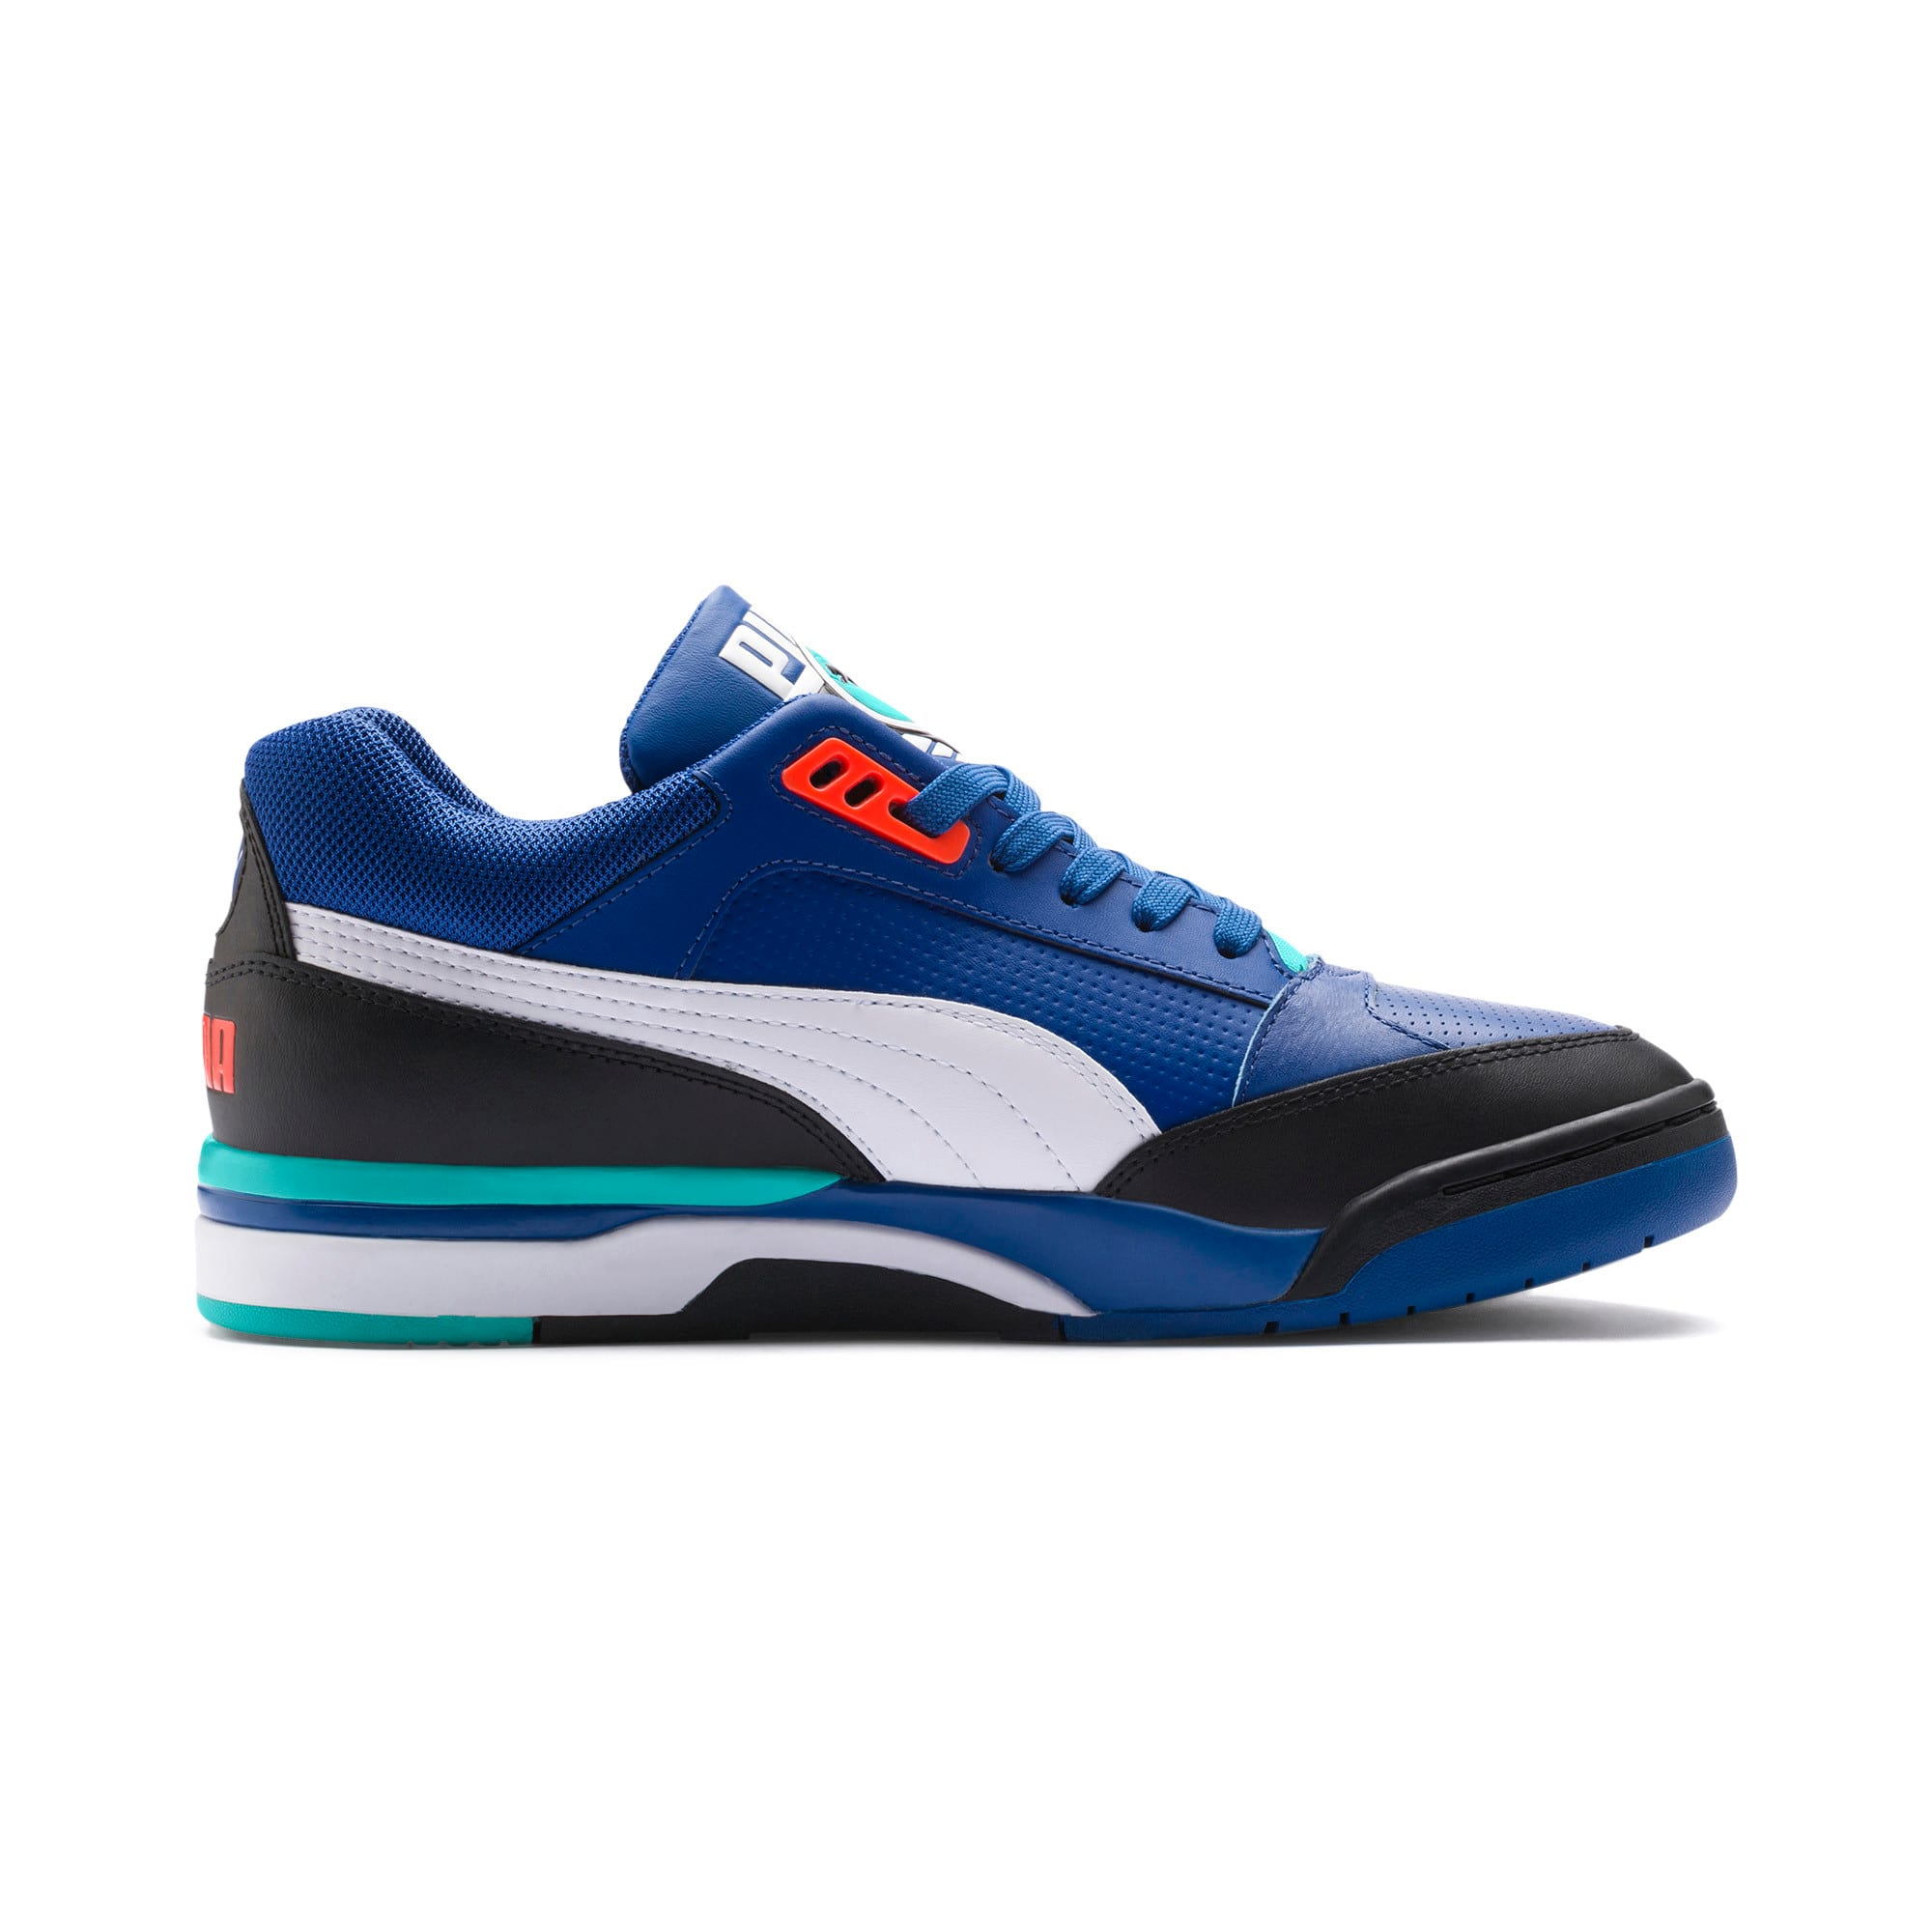 Thumbnail 5 of Palace Guard Sneakers, Puma Black-Puma White-Blue, medium